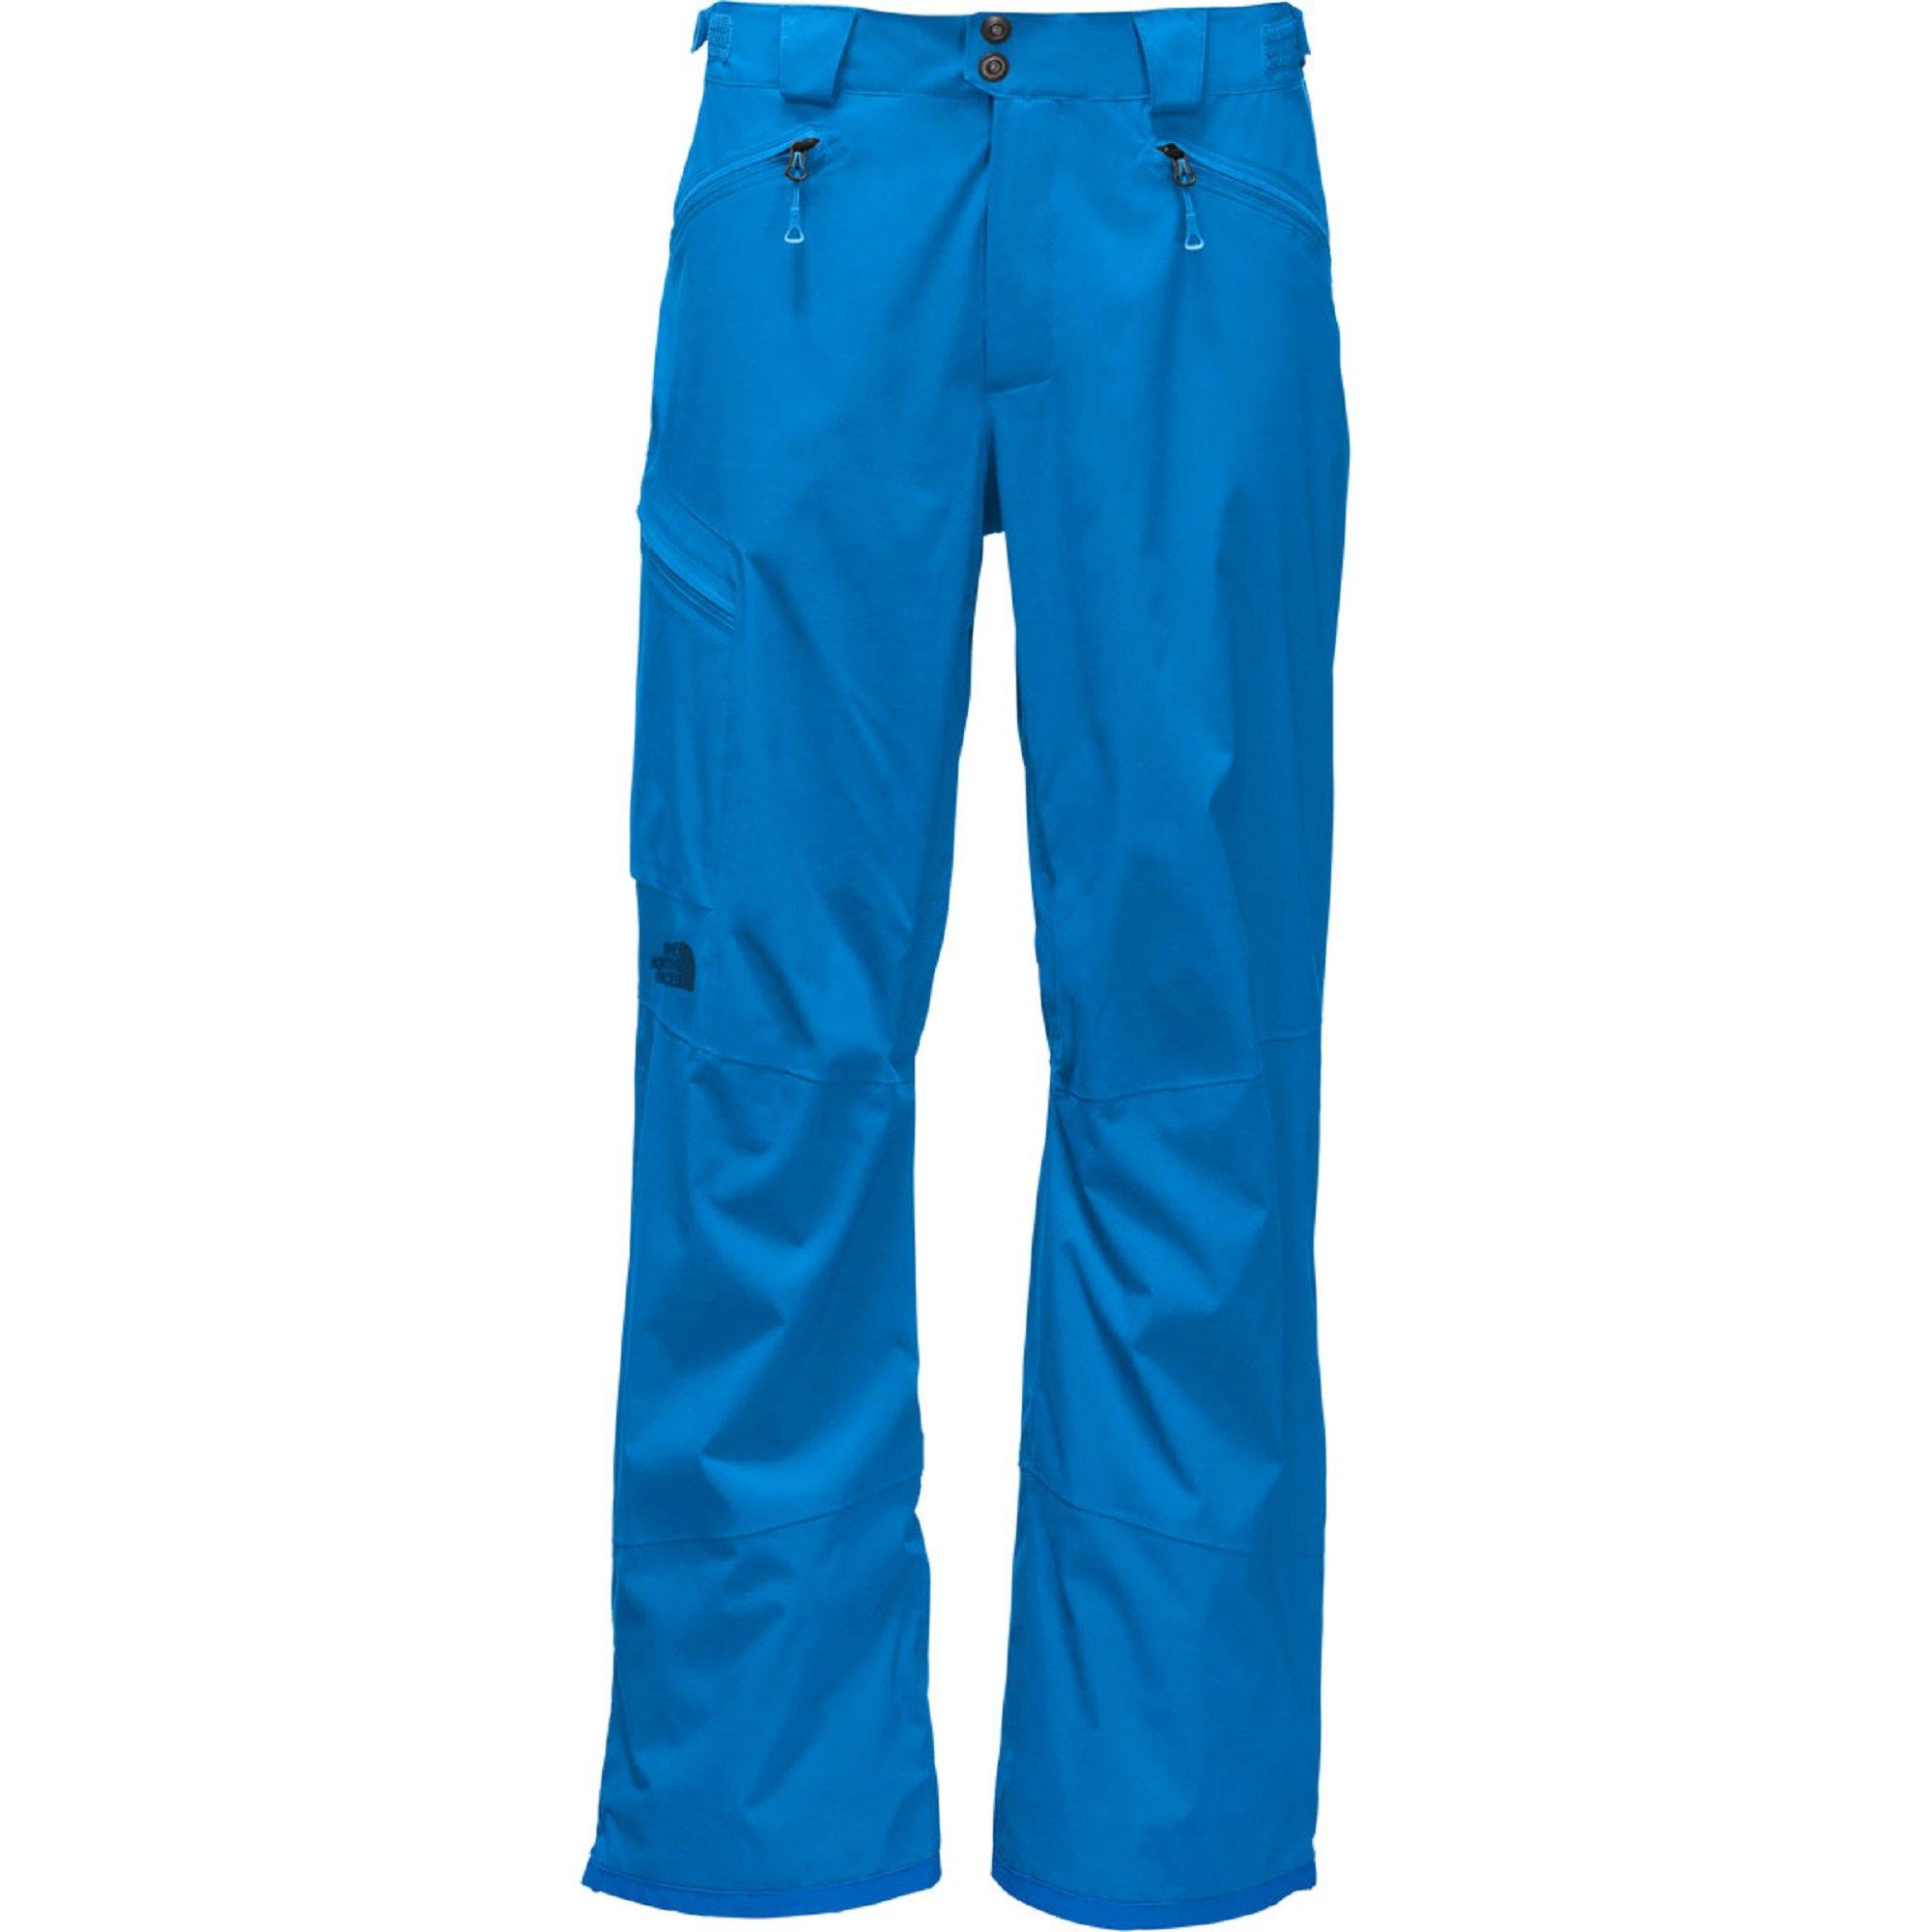 The North Face Men's Sickline Pant Bomber Blue (XXL/reg)